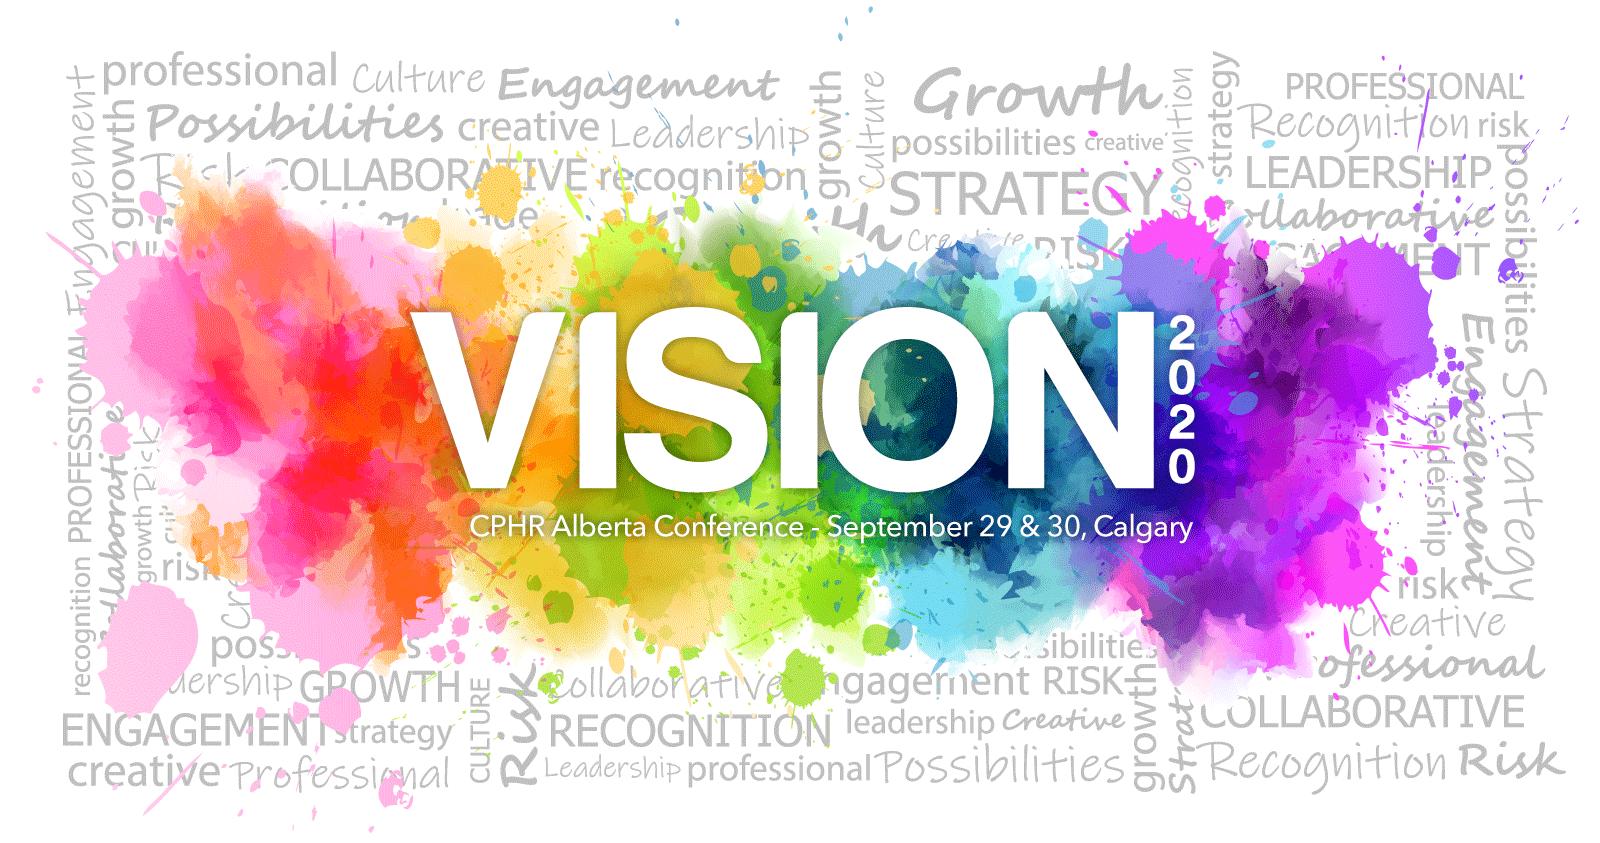 CPHR Alberta Conference: Vision 2020